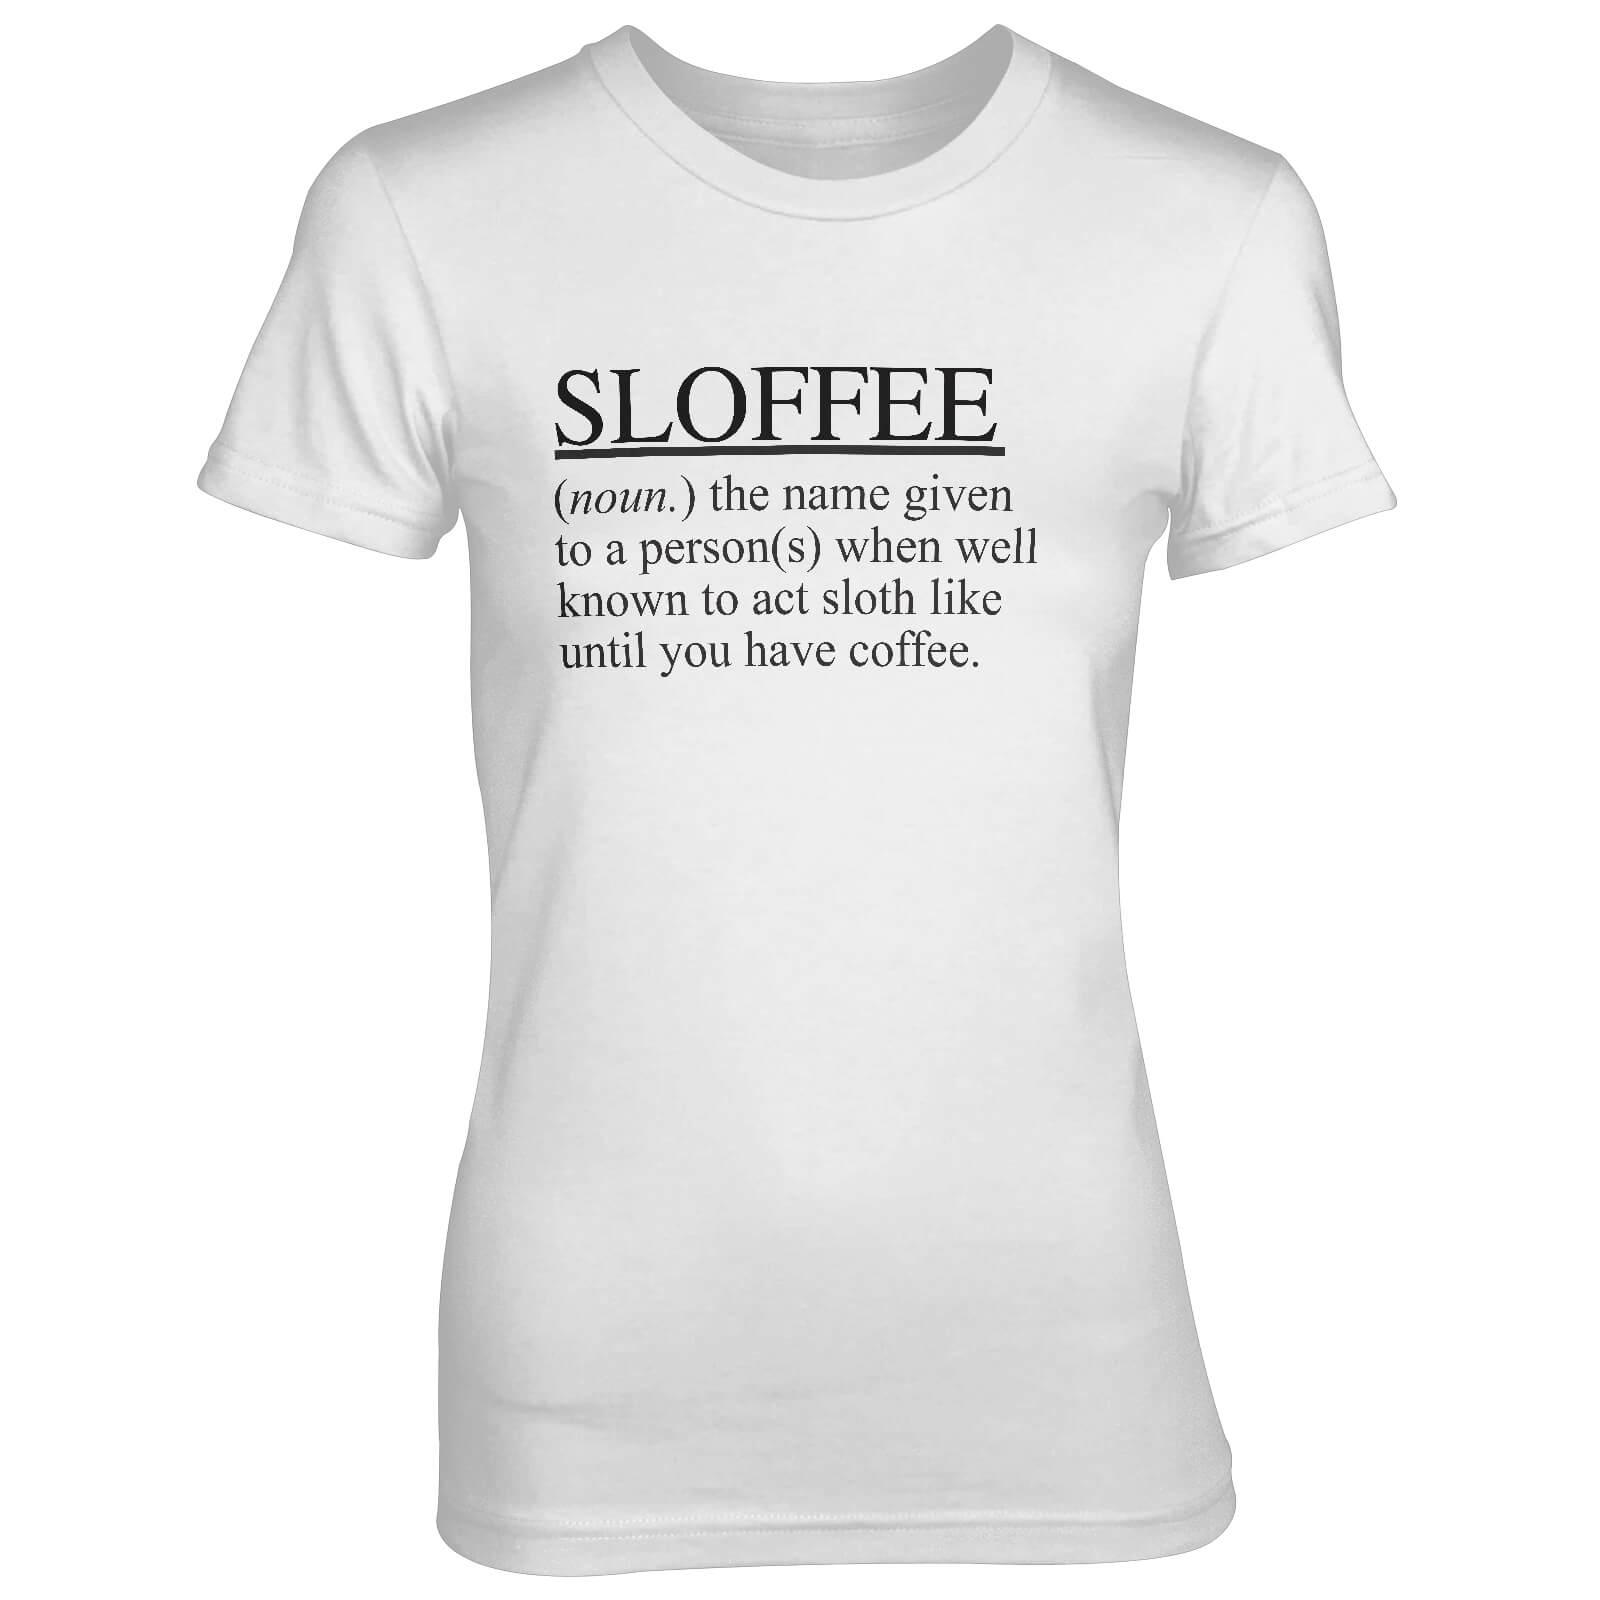 T-Junkie Sloffee Women's White T-Shirt - XL - White